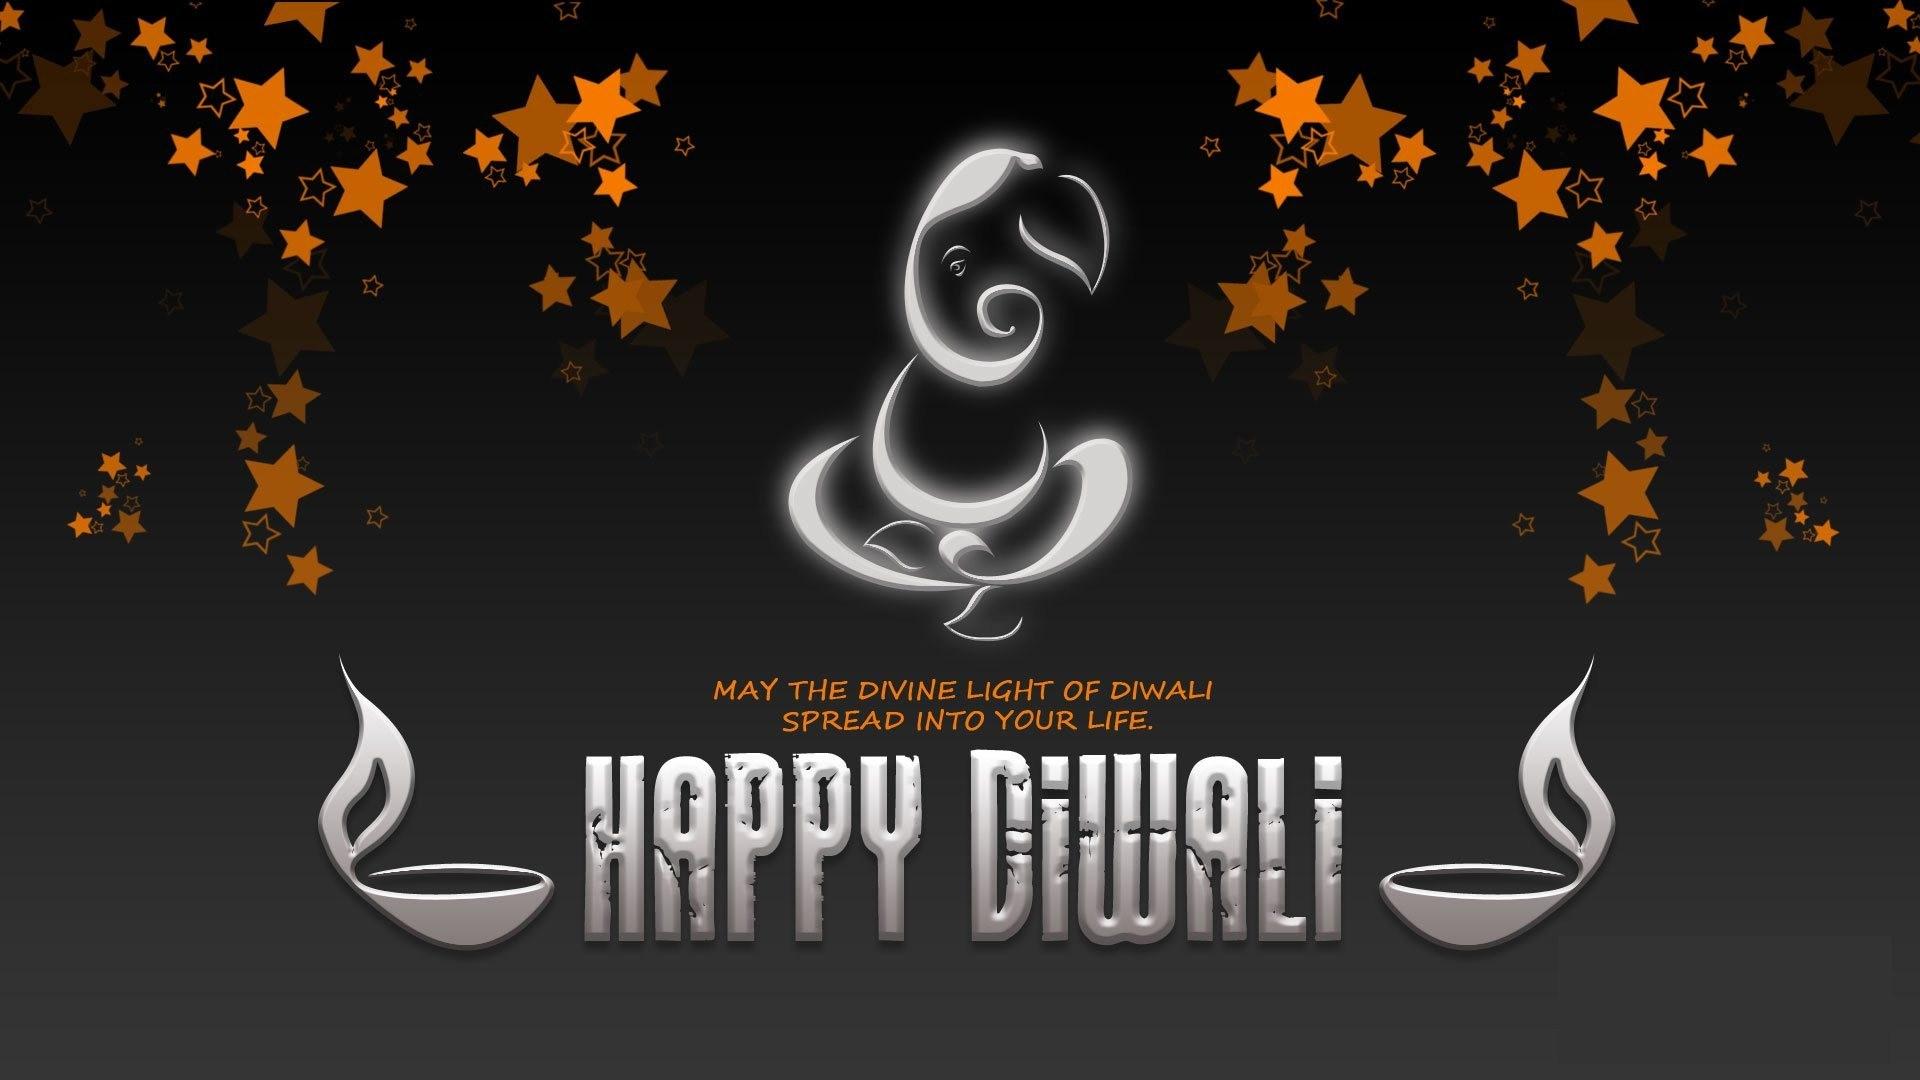 Happy Diwali Wallpaper Hd Widescreen - Happy Diwali Black Background , HD Wallpaper & Backgrounds